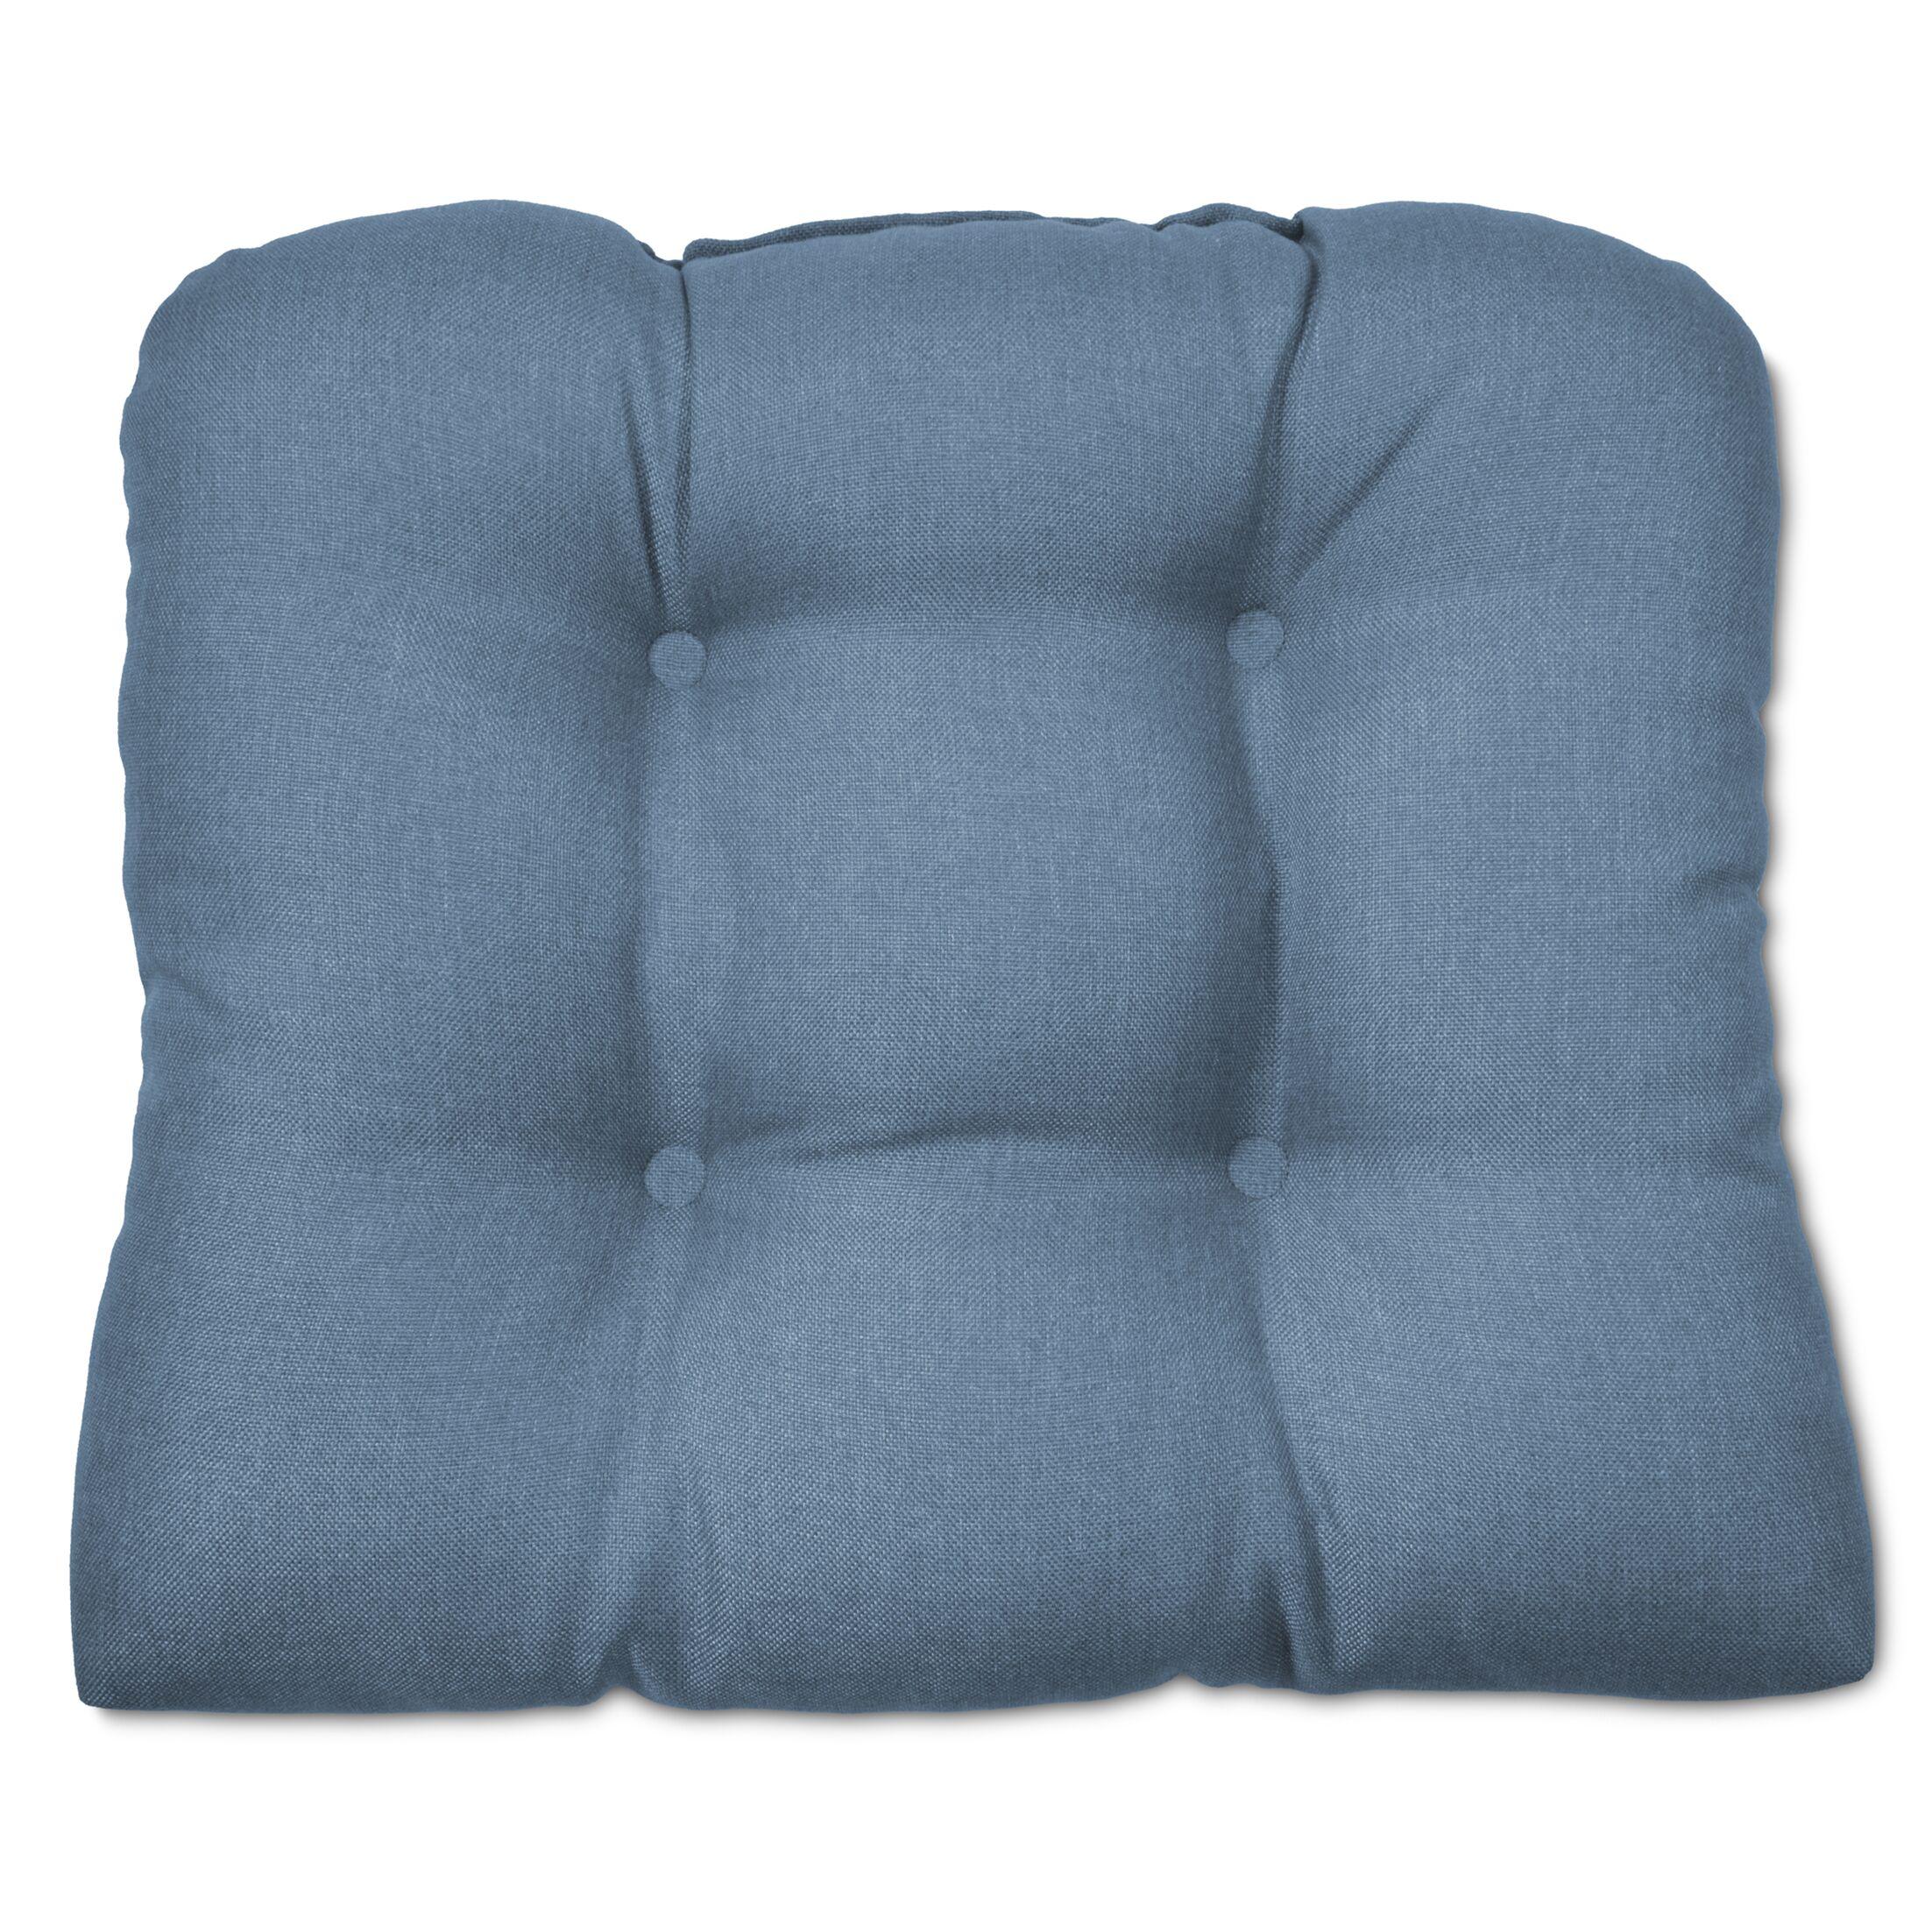 OutdoorDining Chair Cushion Fabric: Medium Blue